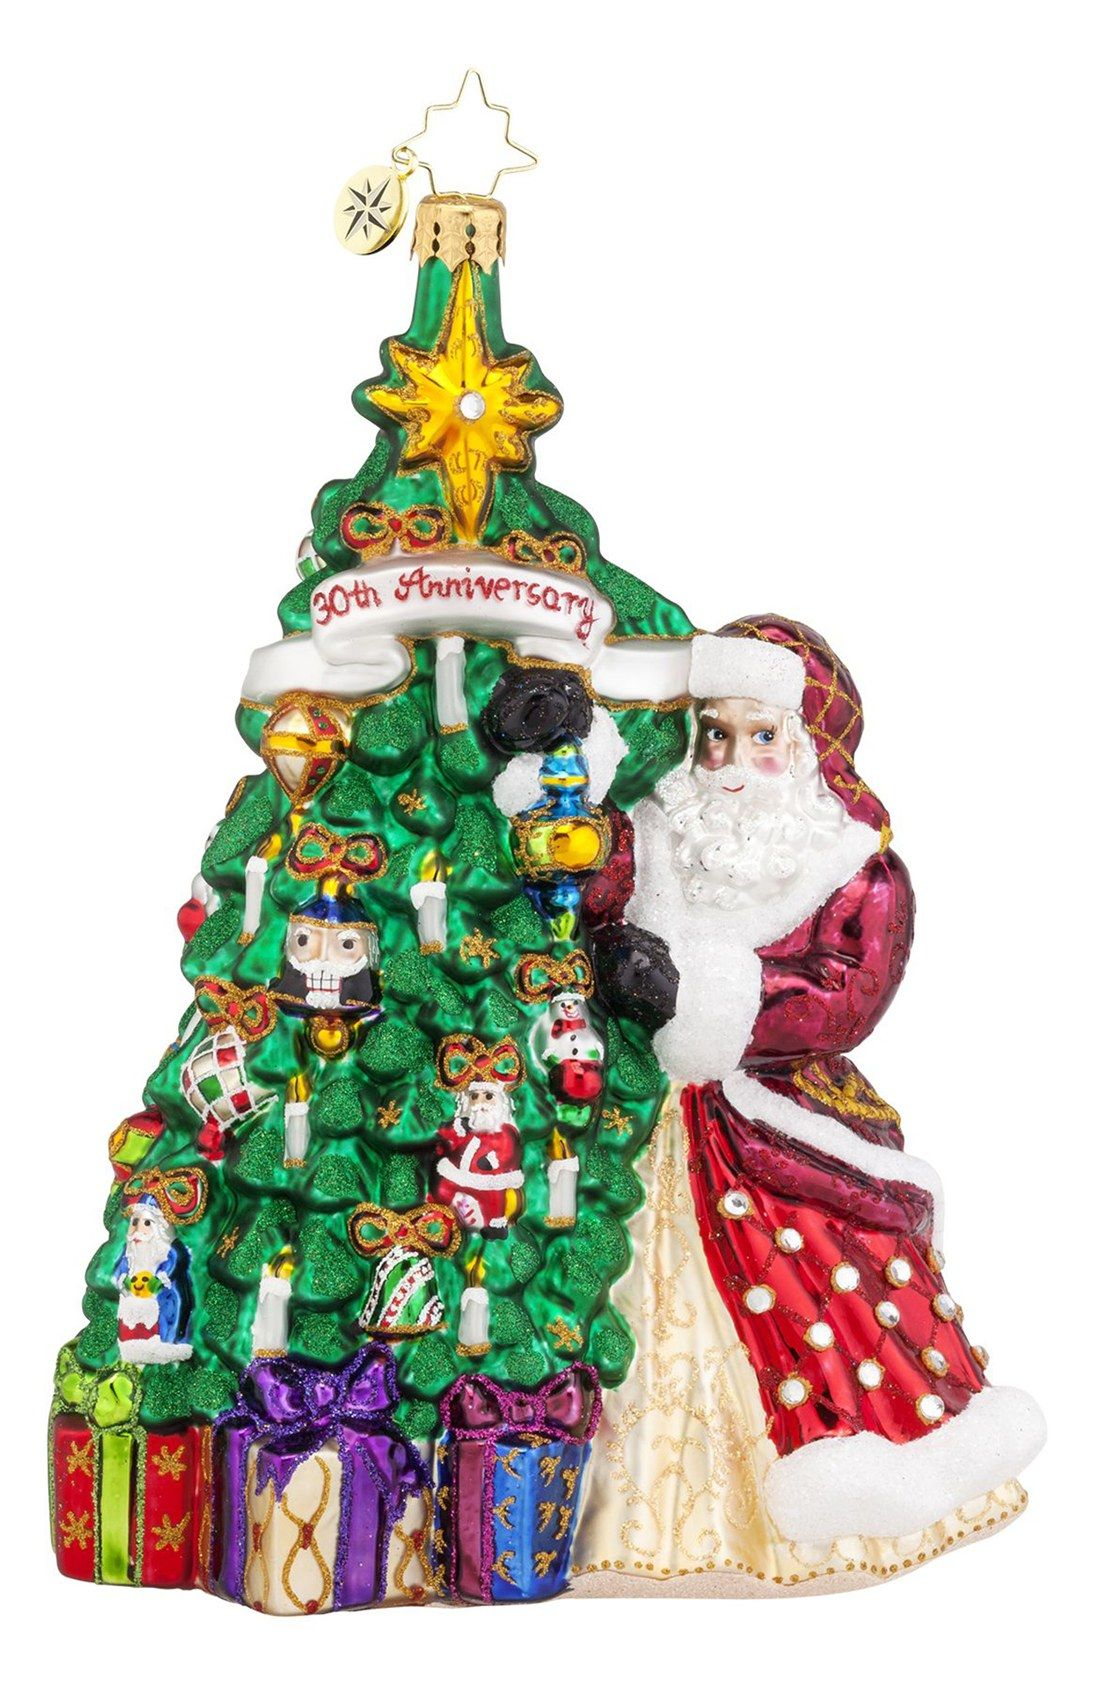 Christopher Radko 30th Anniversary Hanging With Joy Santa Tree Ornament Nordstrom Glass Christmas Ornaments Christmas Ornaments Christopher Radko Ornaments